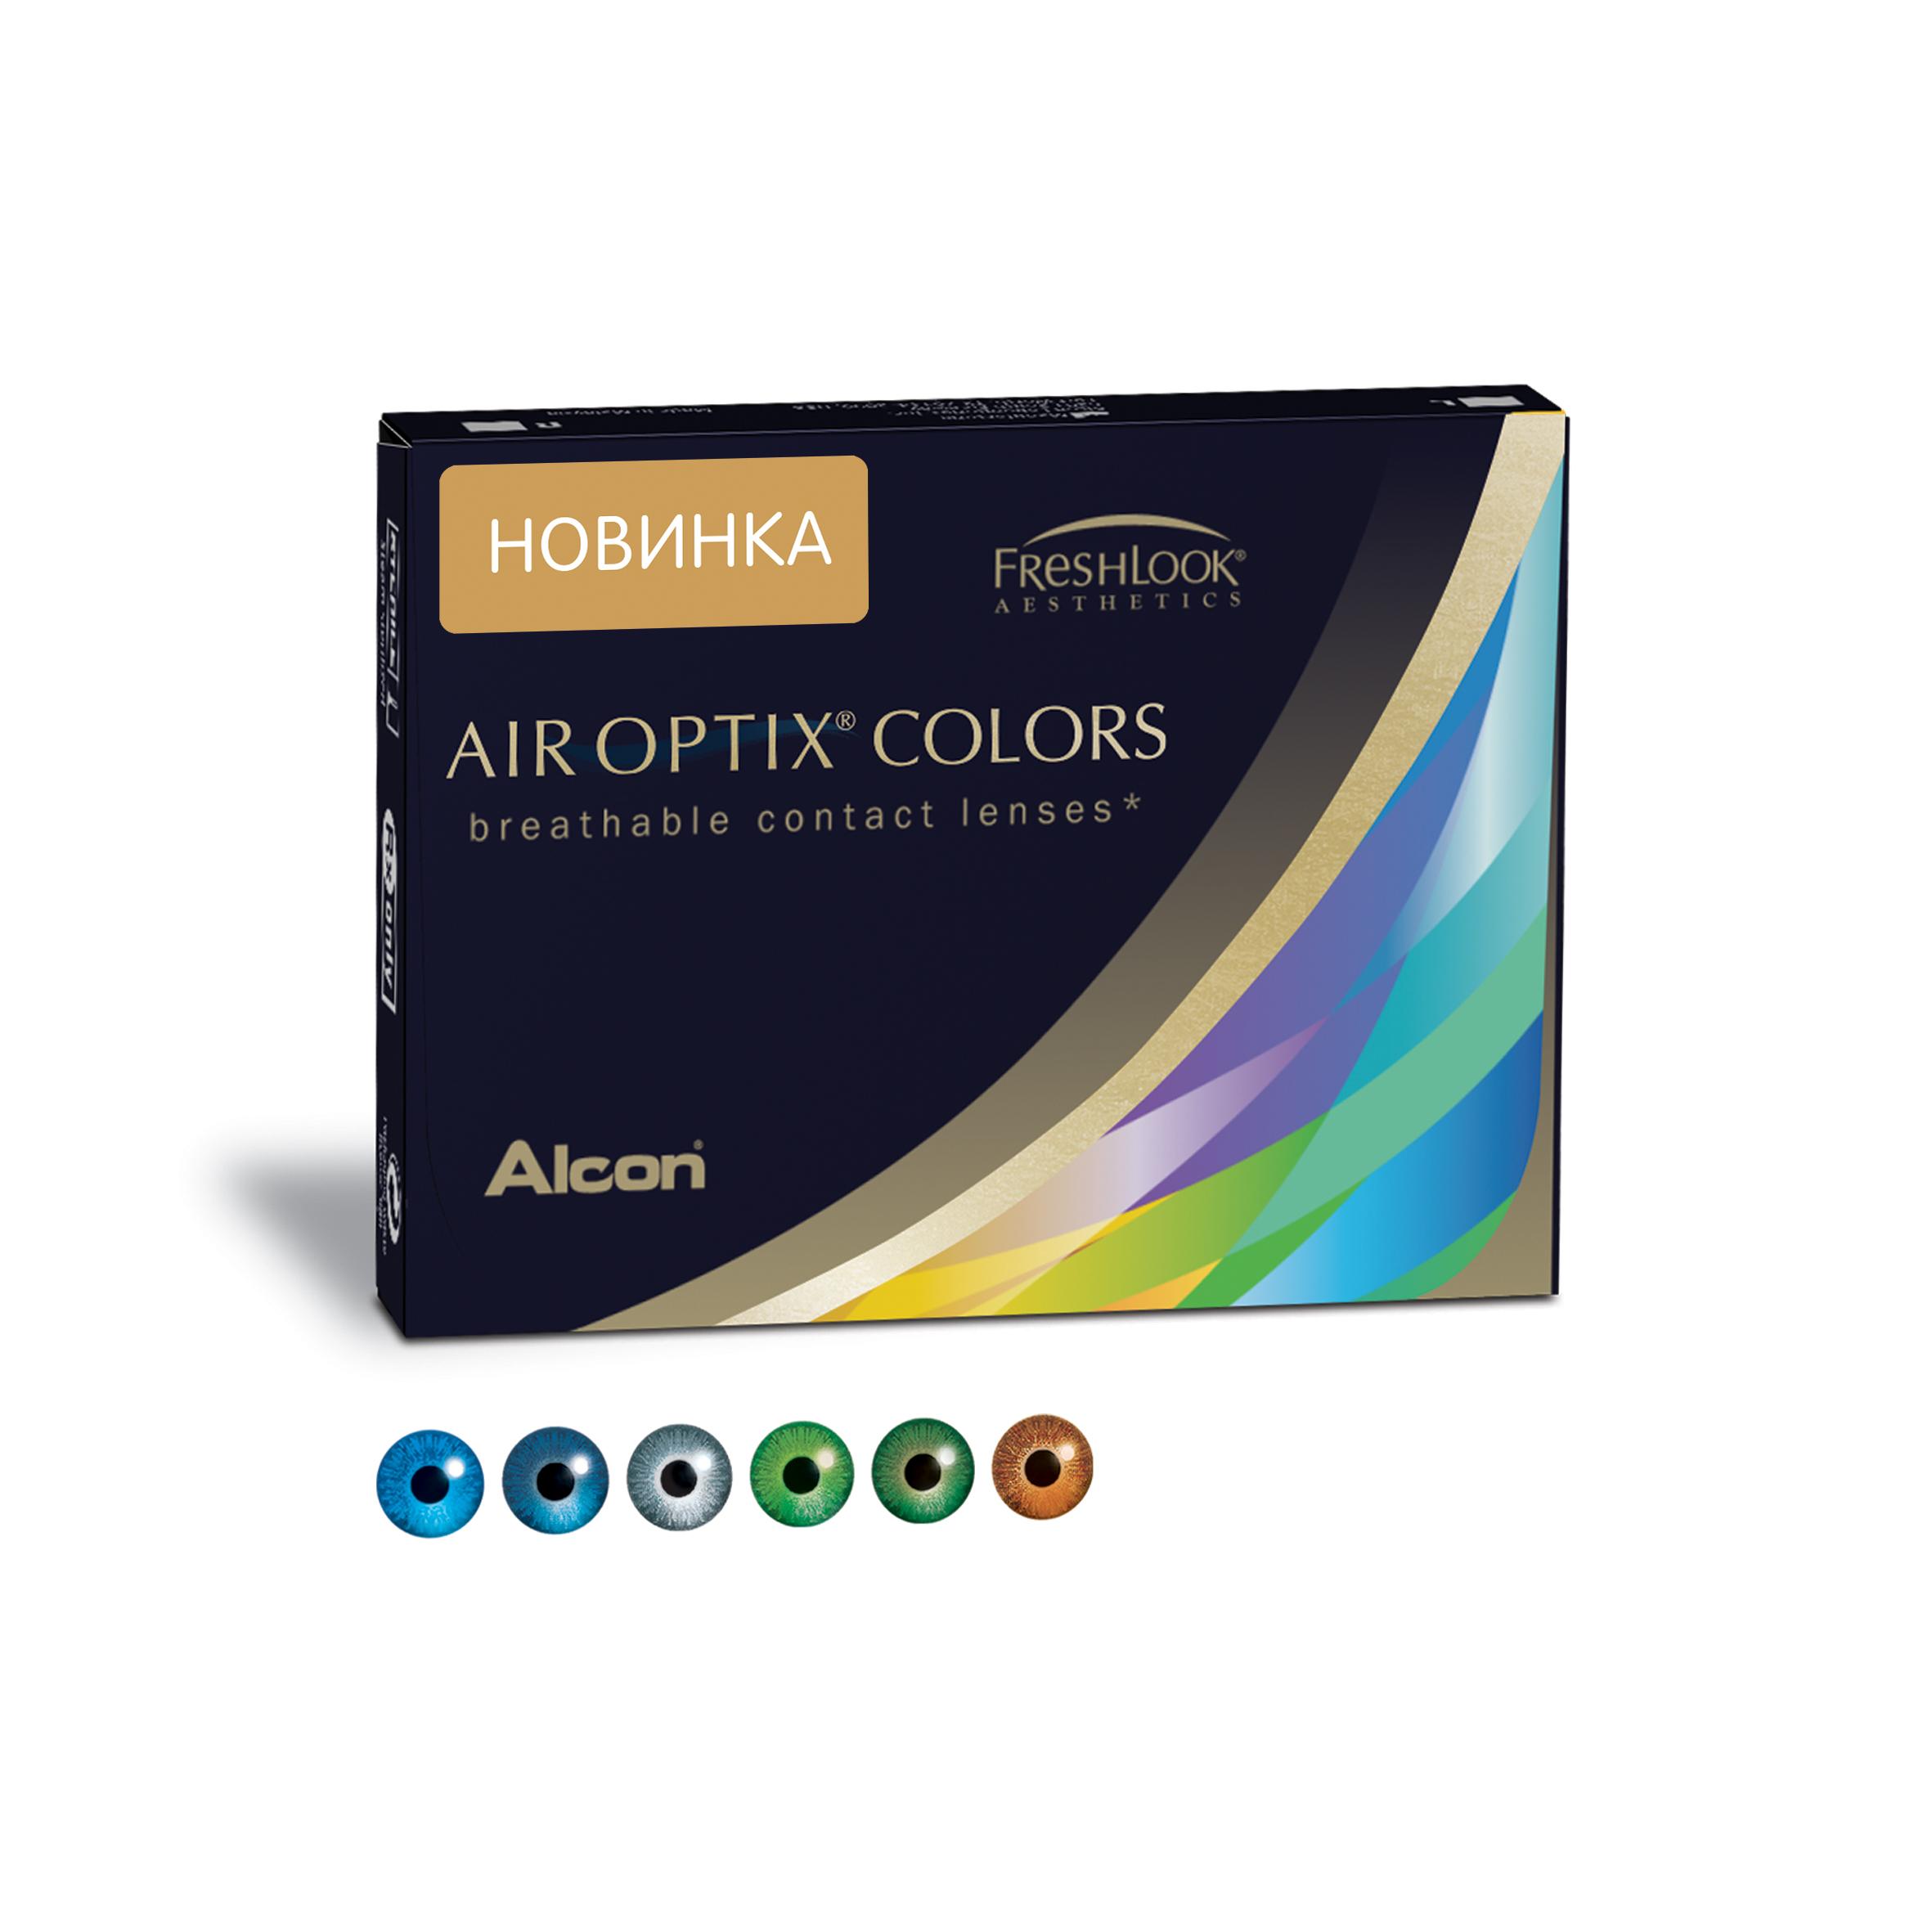 Аlcon контактные линзы Air Optix Colors 2 шт -1.75 Gemstone Green31746151Мягкие контактные линзы